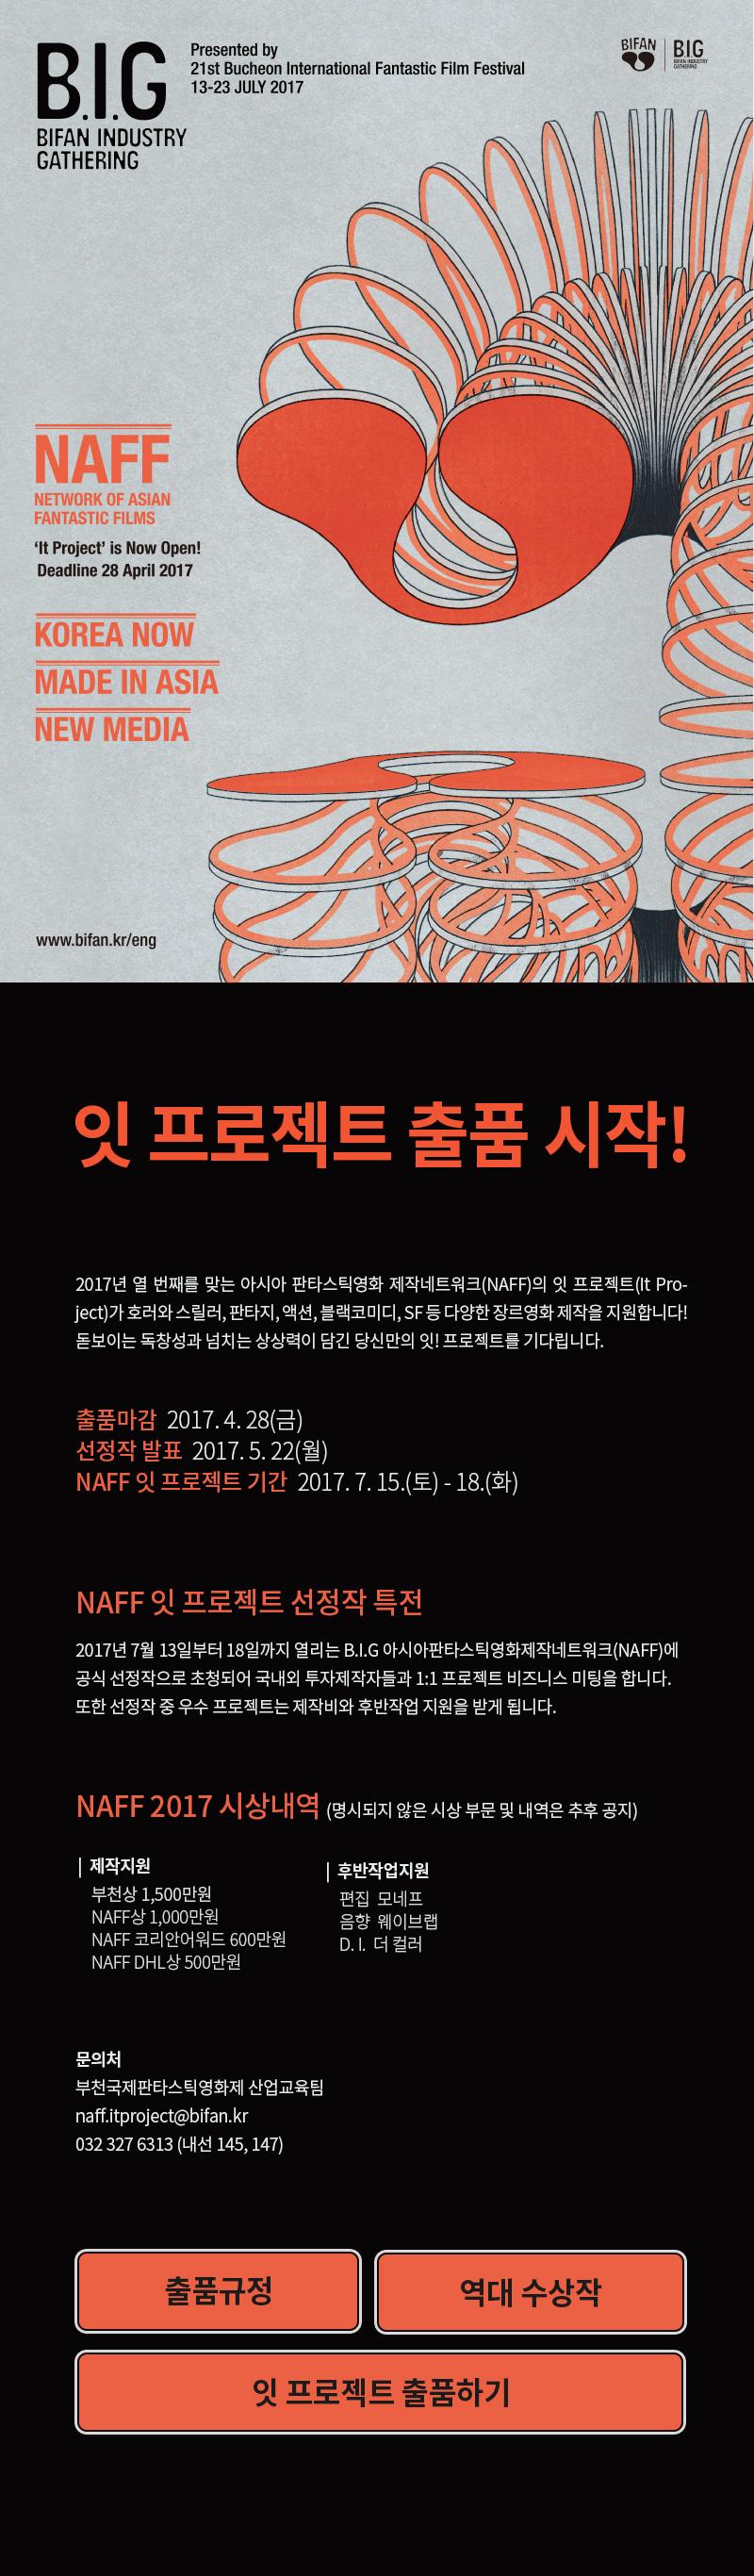 NAFF 2017 잇 프로젝트 출품